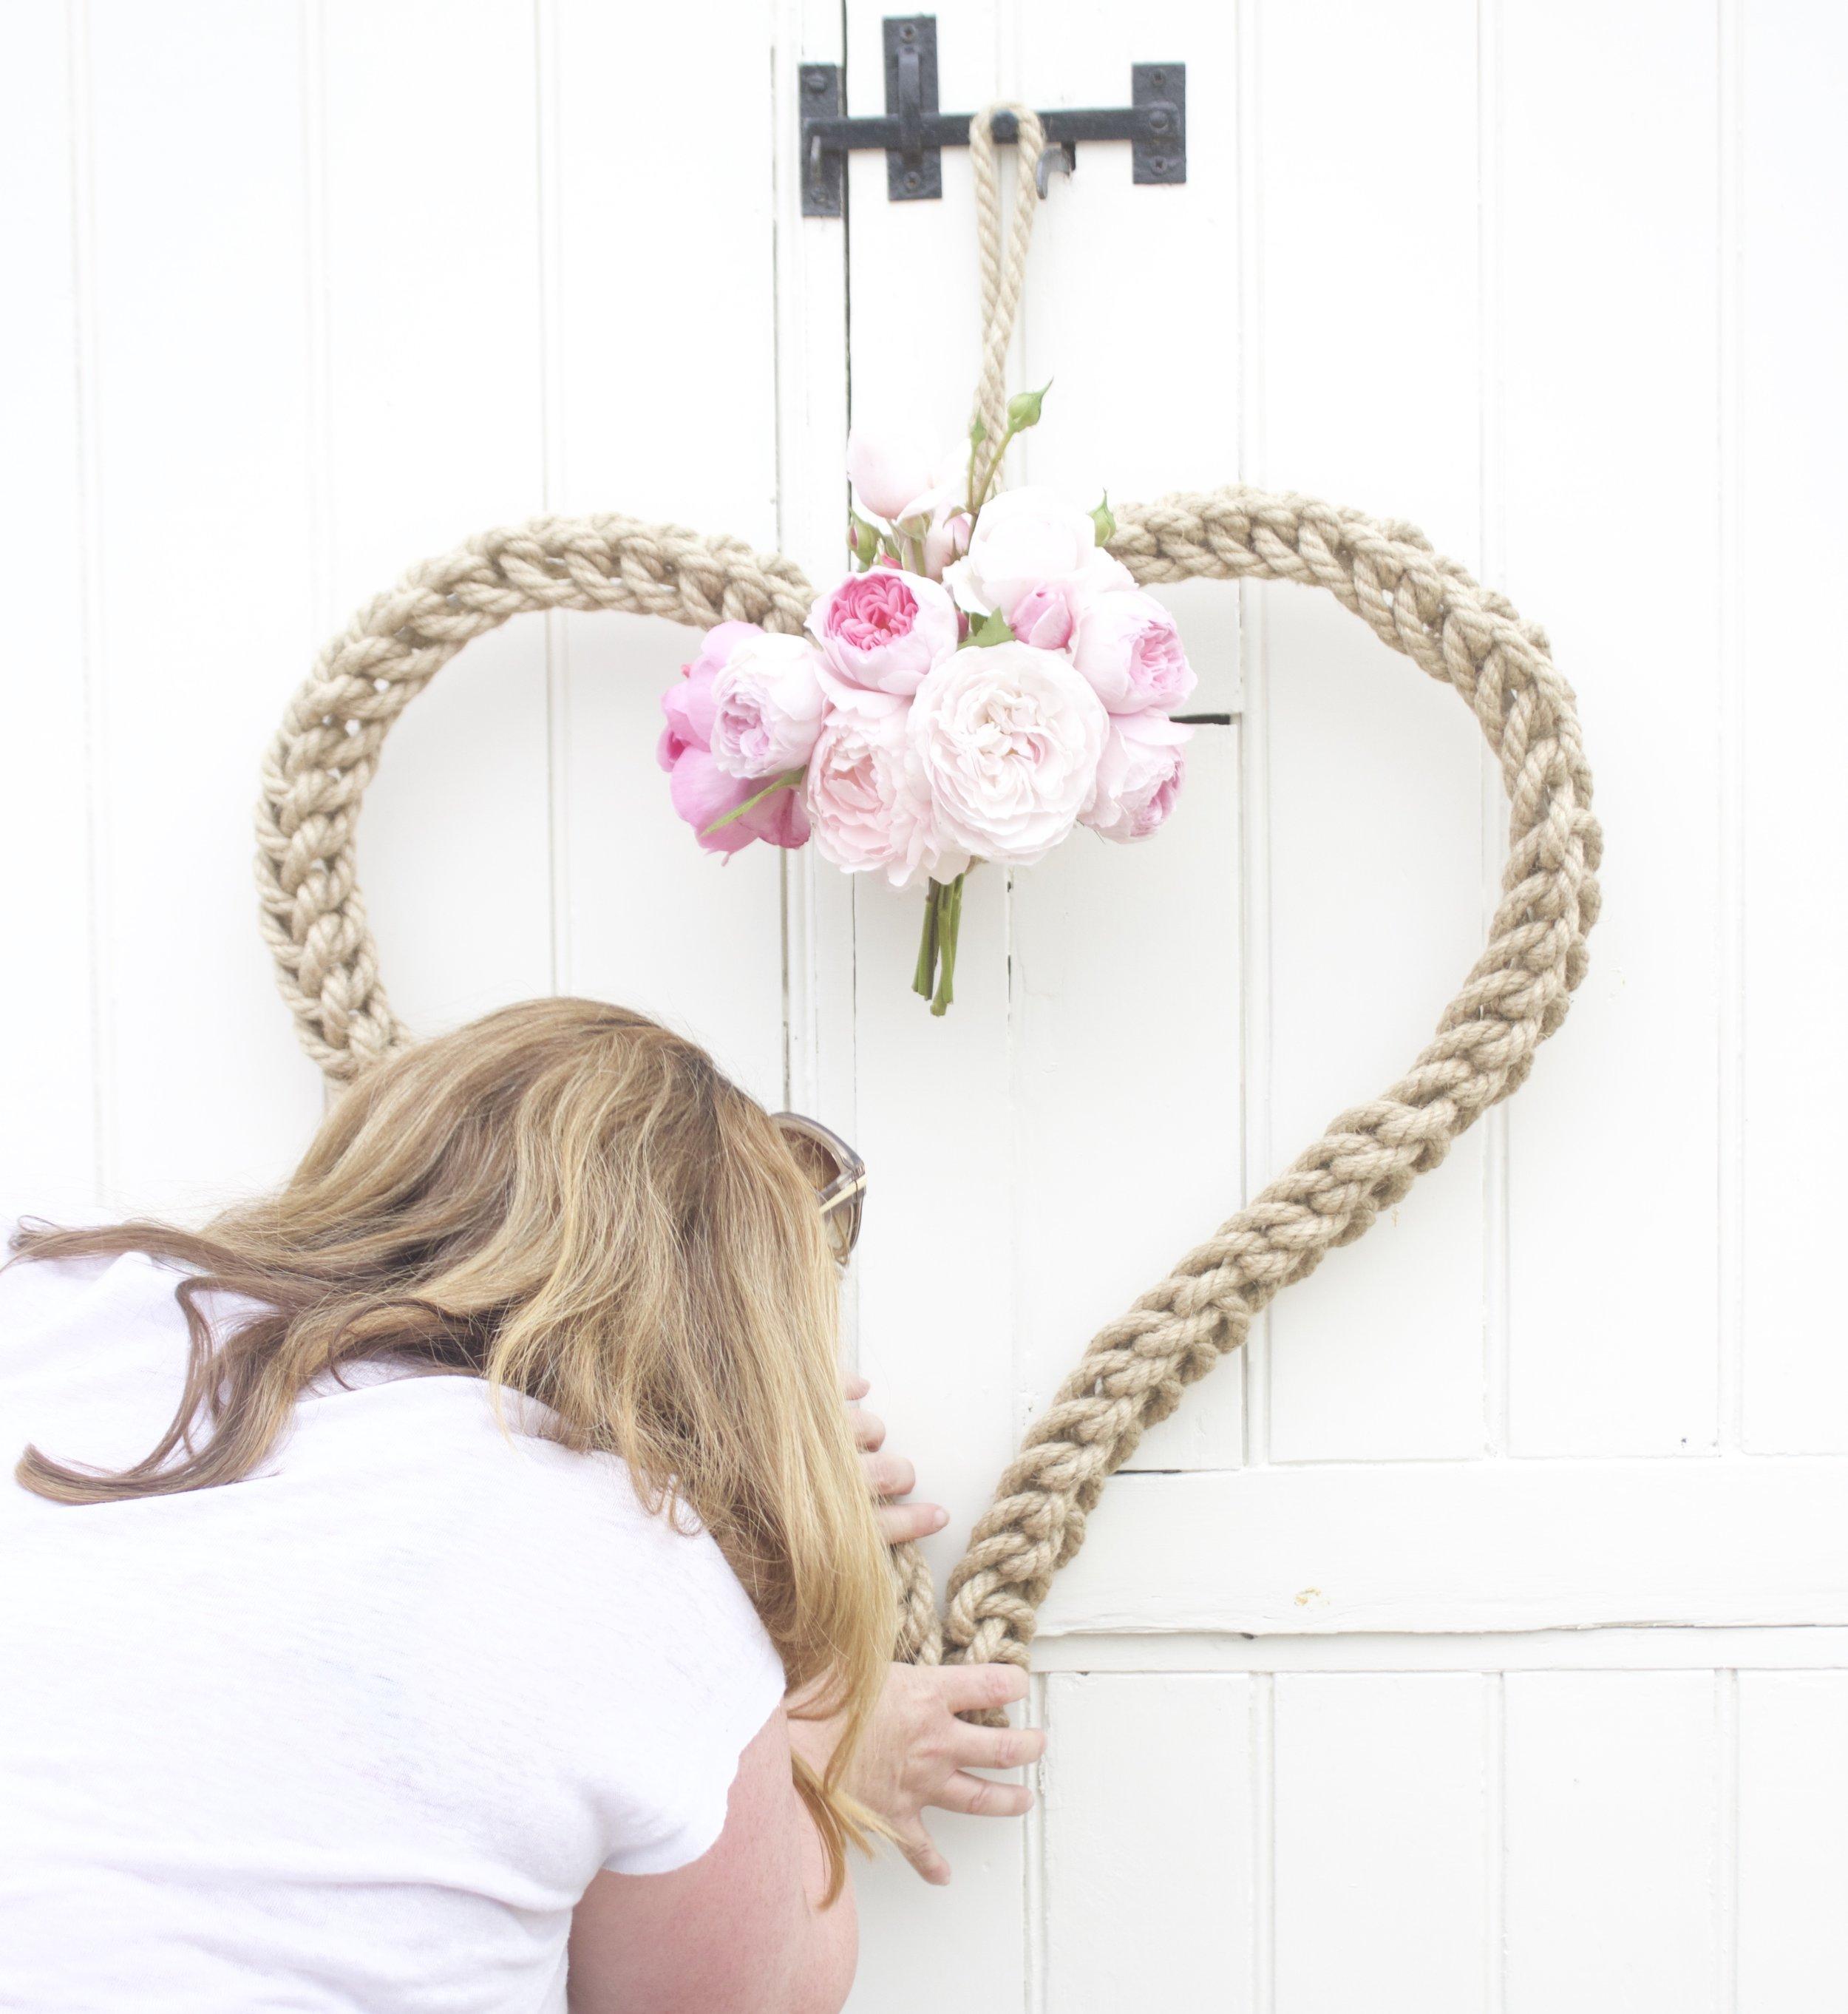 handmade heart rope wreath and roses jpg